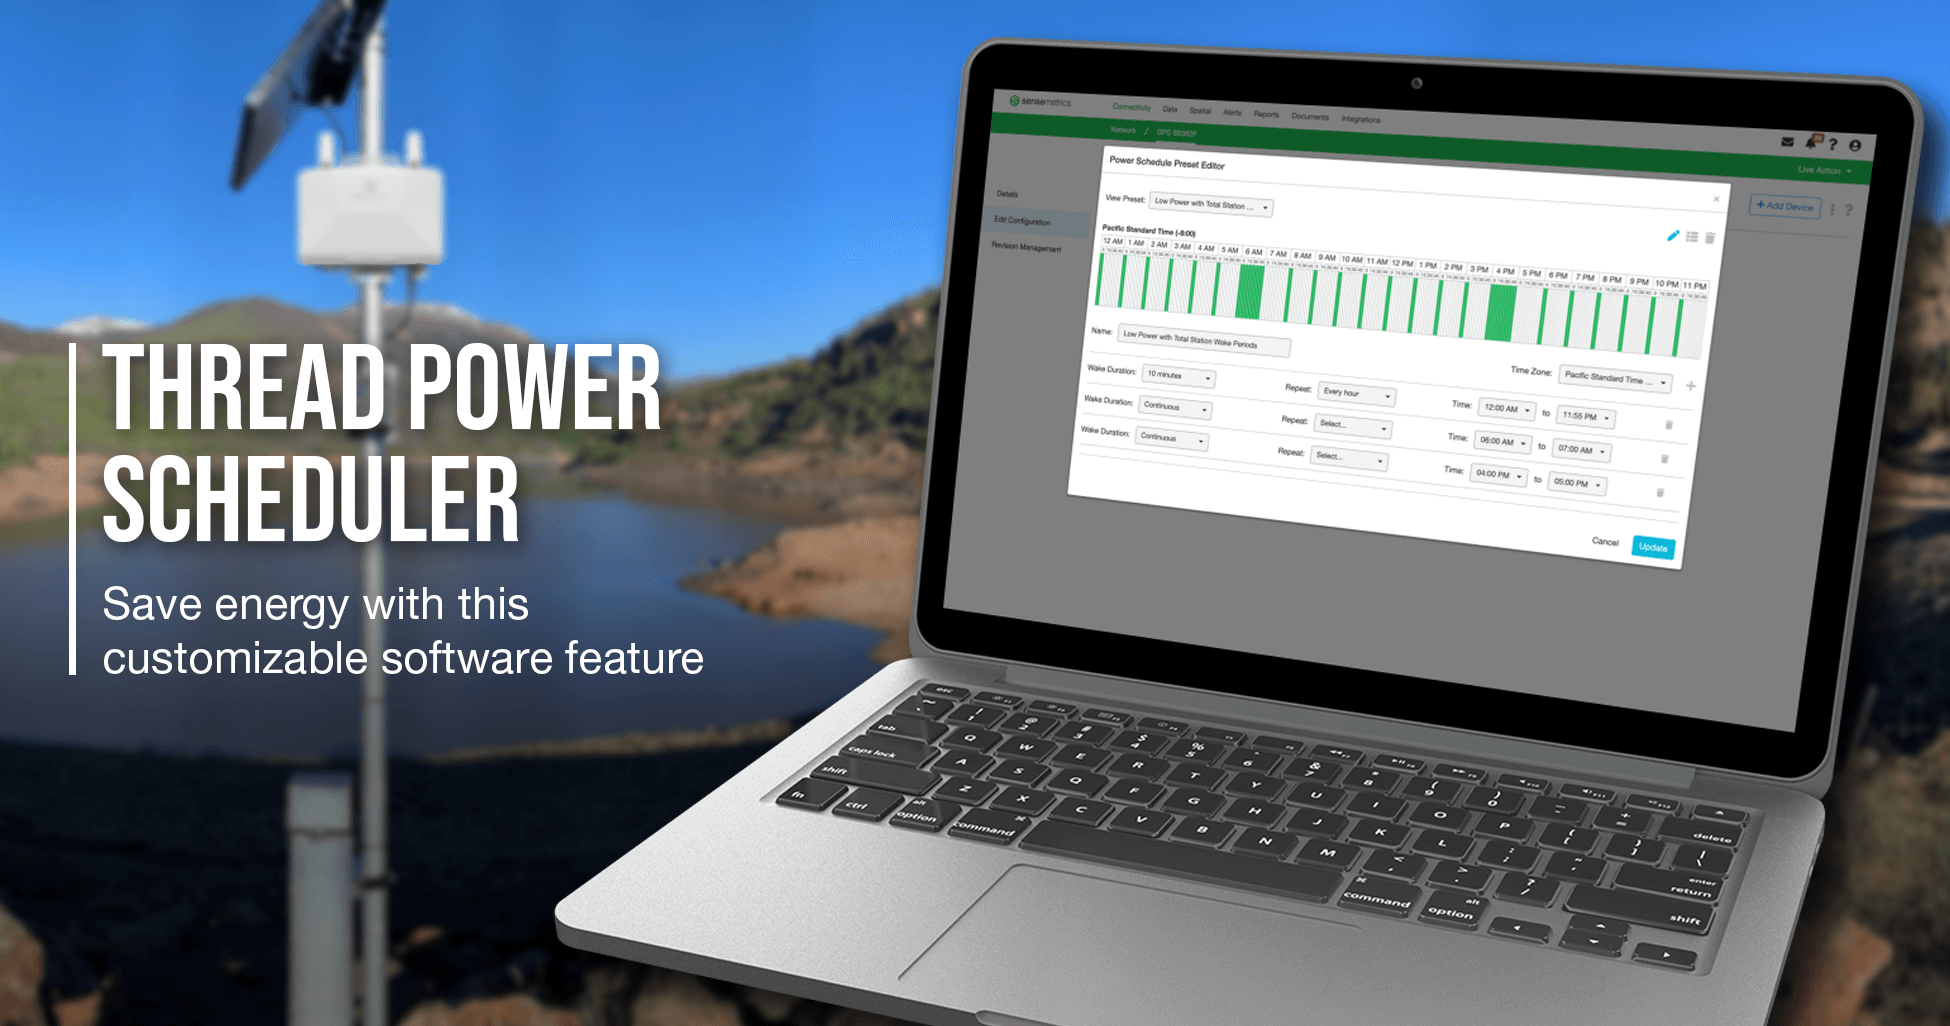 Feature Share: Thread Power Scheduler